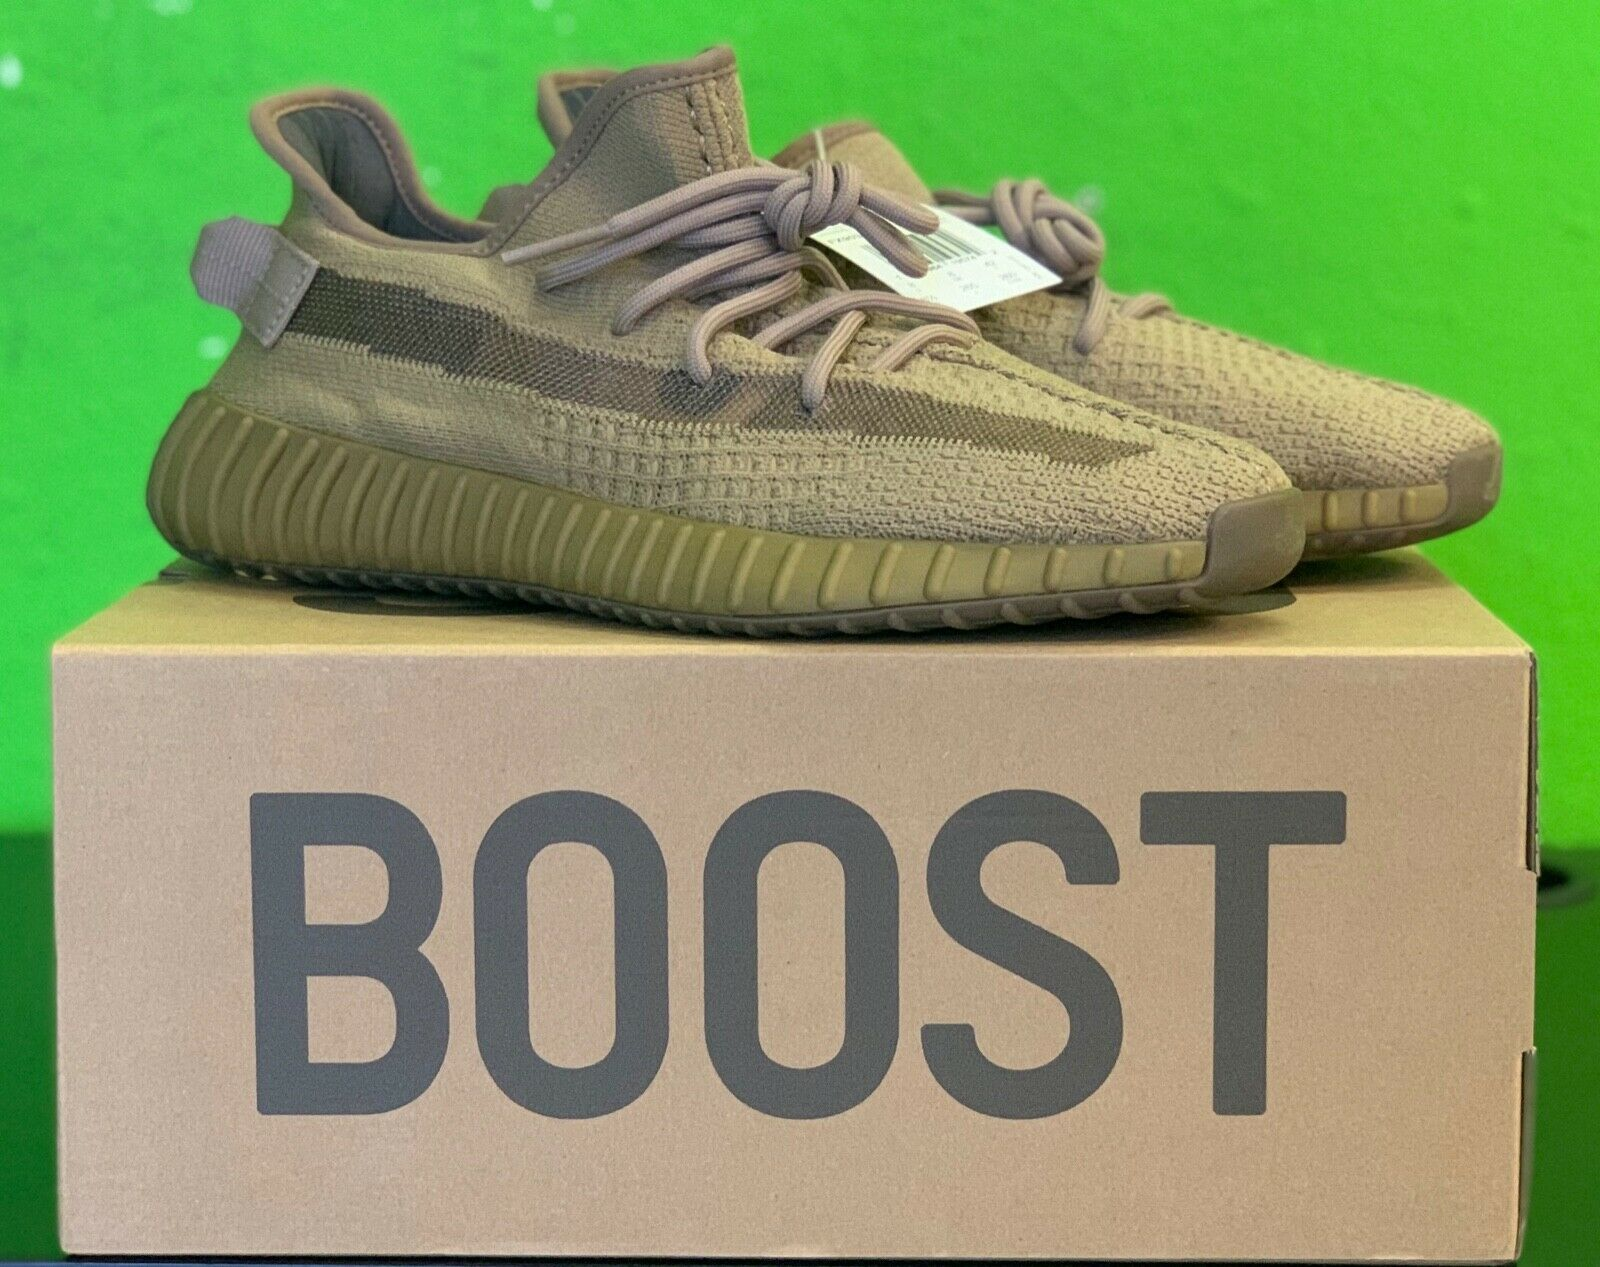 Ponte de pie en su lugar sarcoma Culpable  100 Authentic Yeezy Season 4 Military Combat Boot Sand Kanye West EUR 43  for sale online | eBay